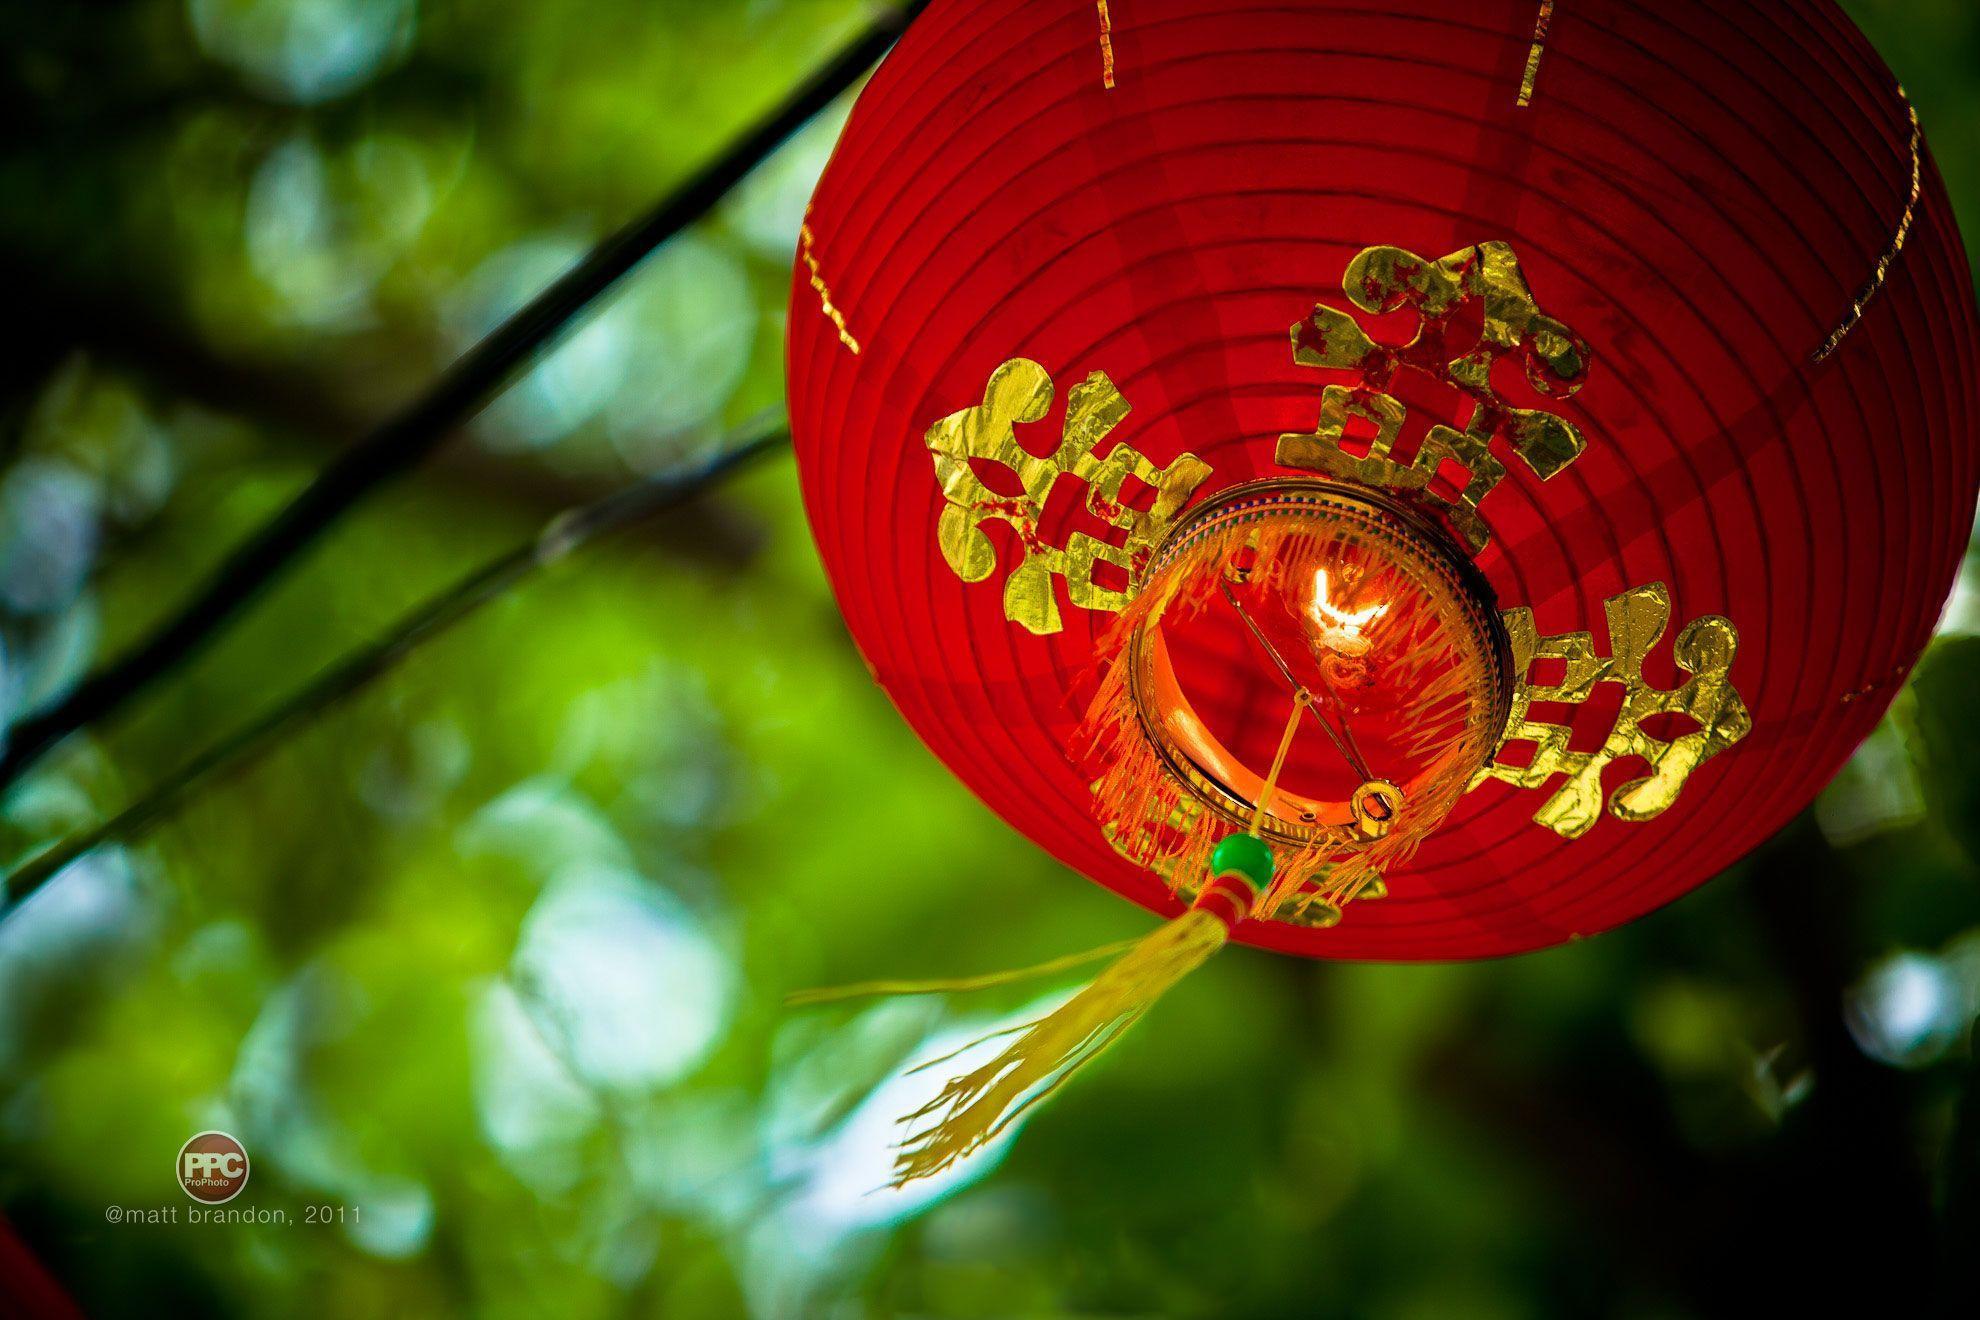 Chinese New Year Wallpaper by Matt Brandon - ProVideo Coalition